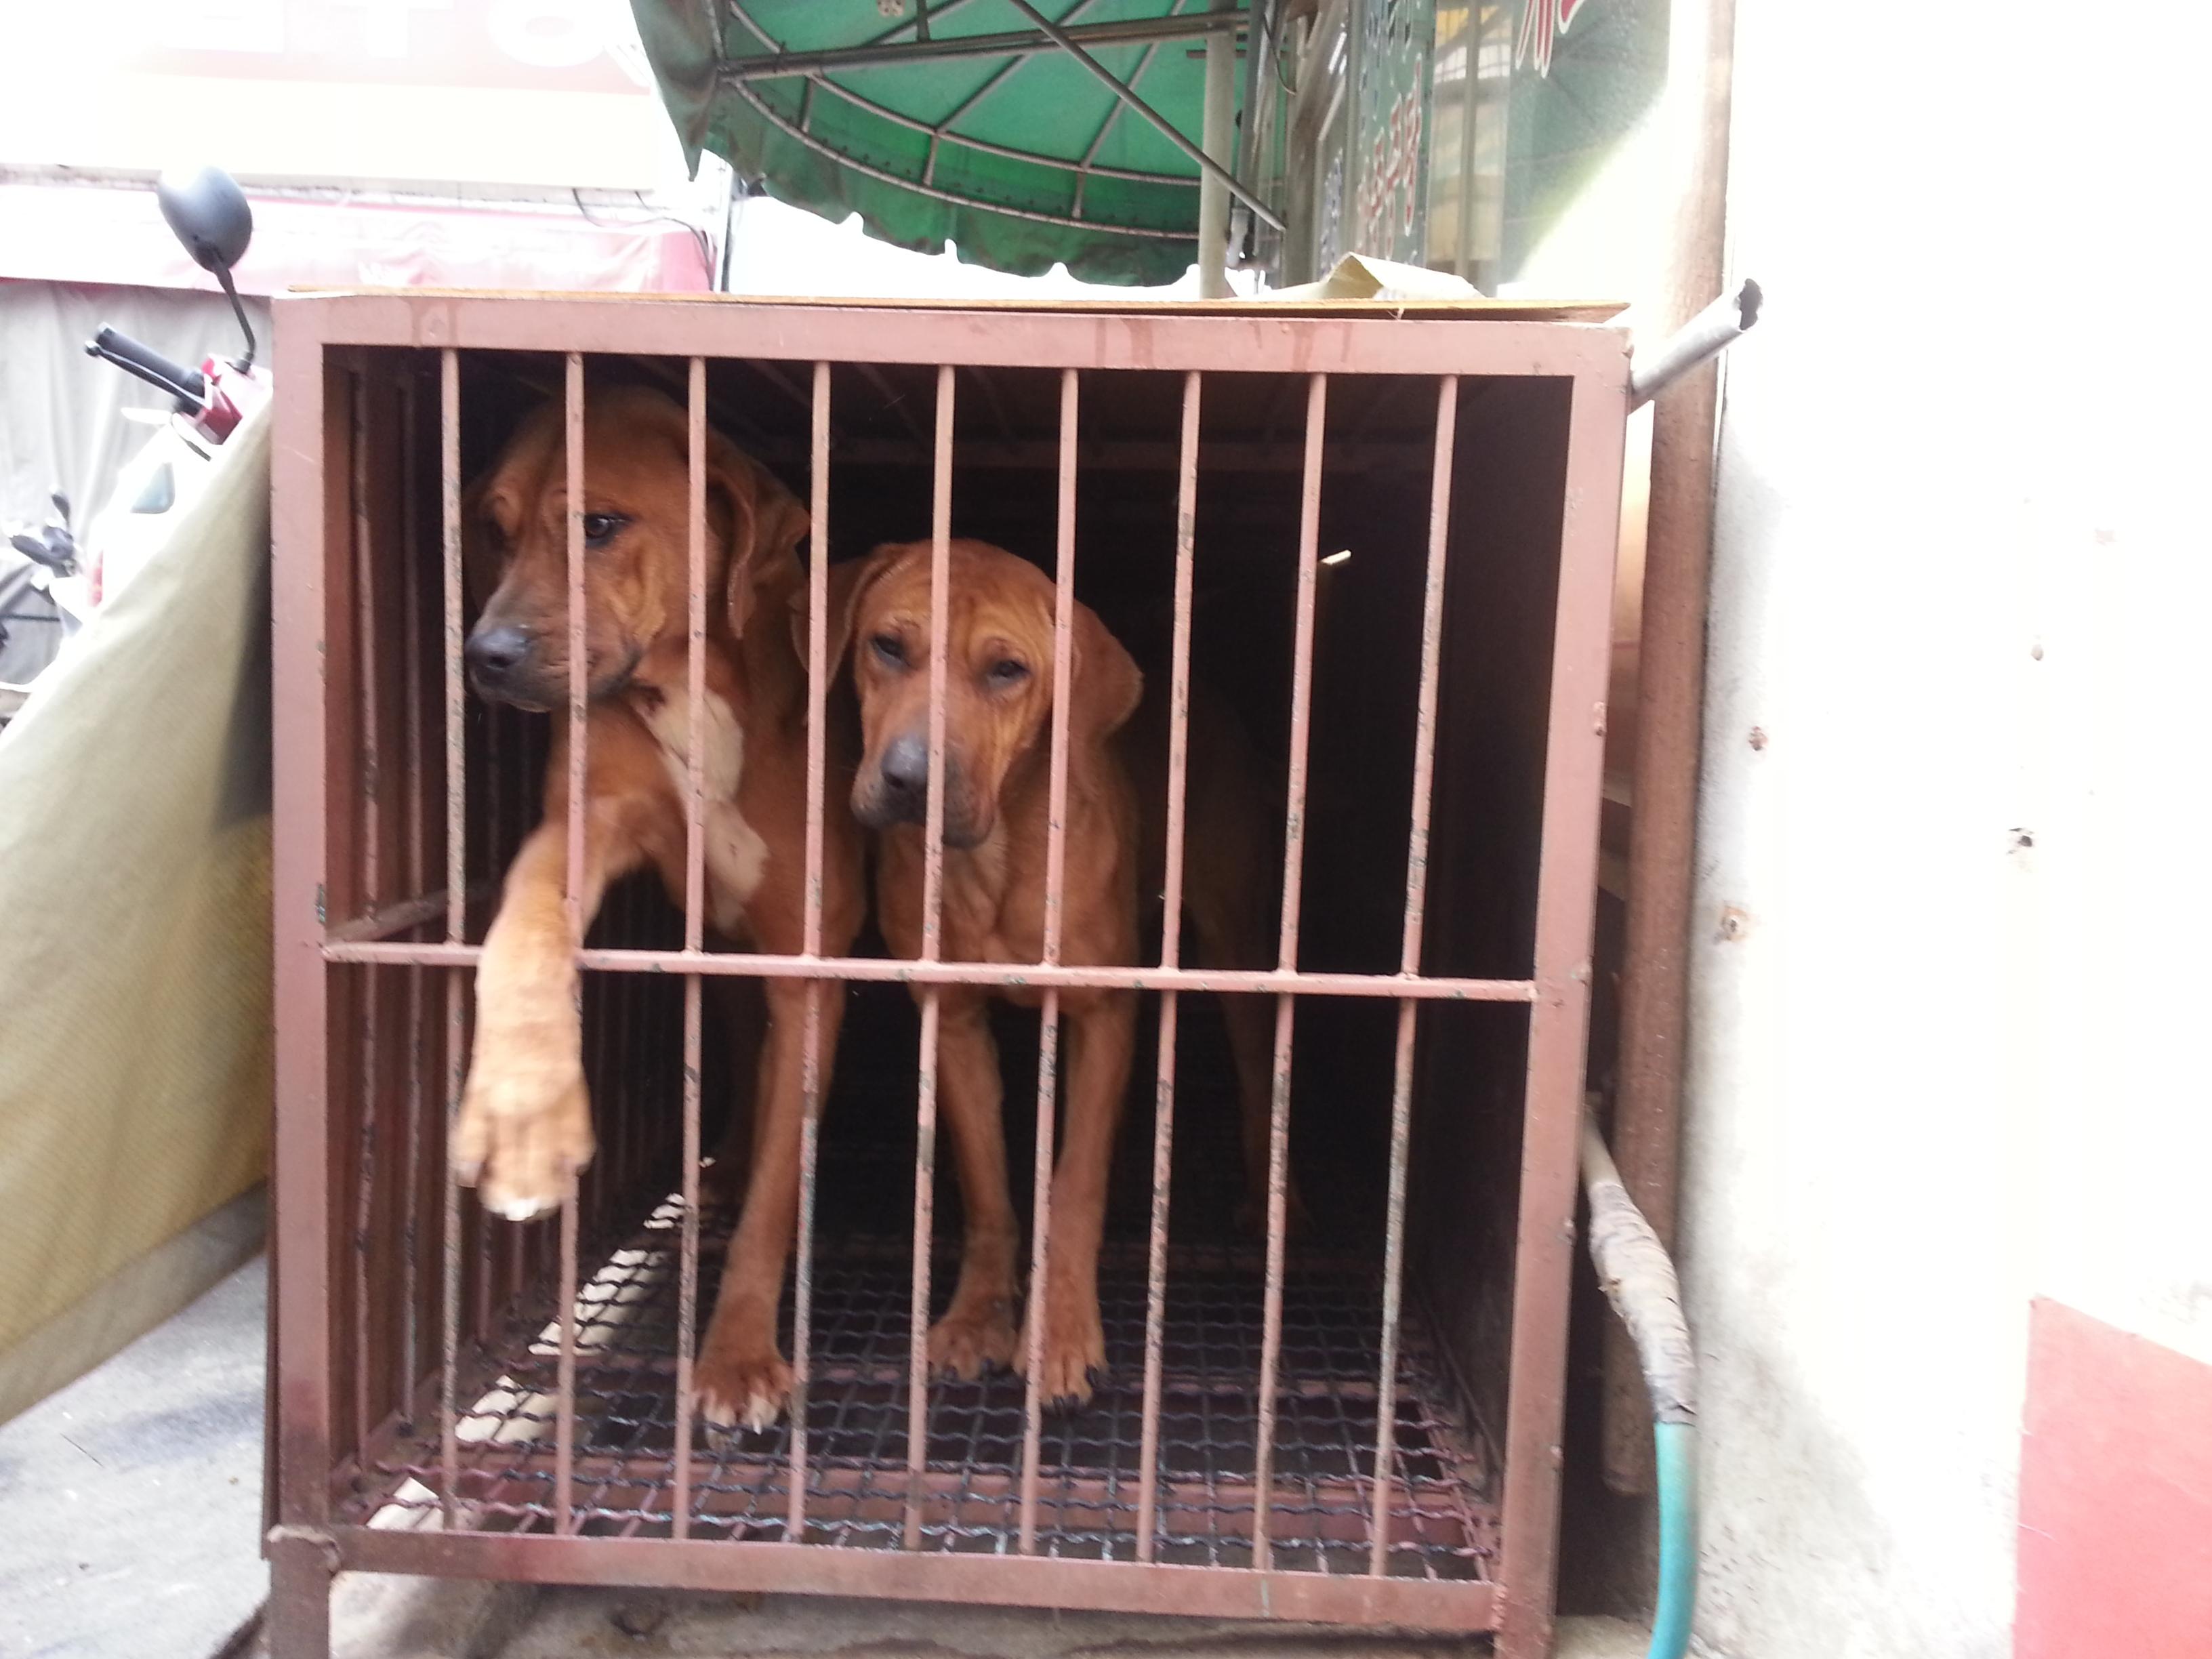 South Korea's Dog Meat Question